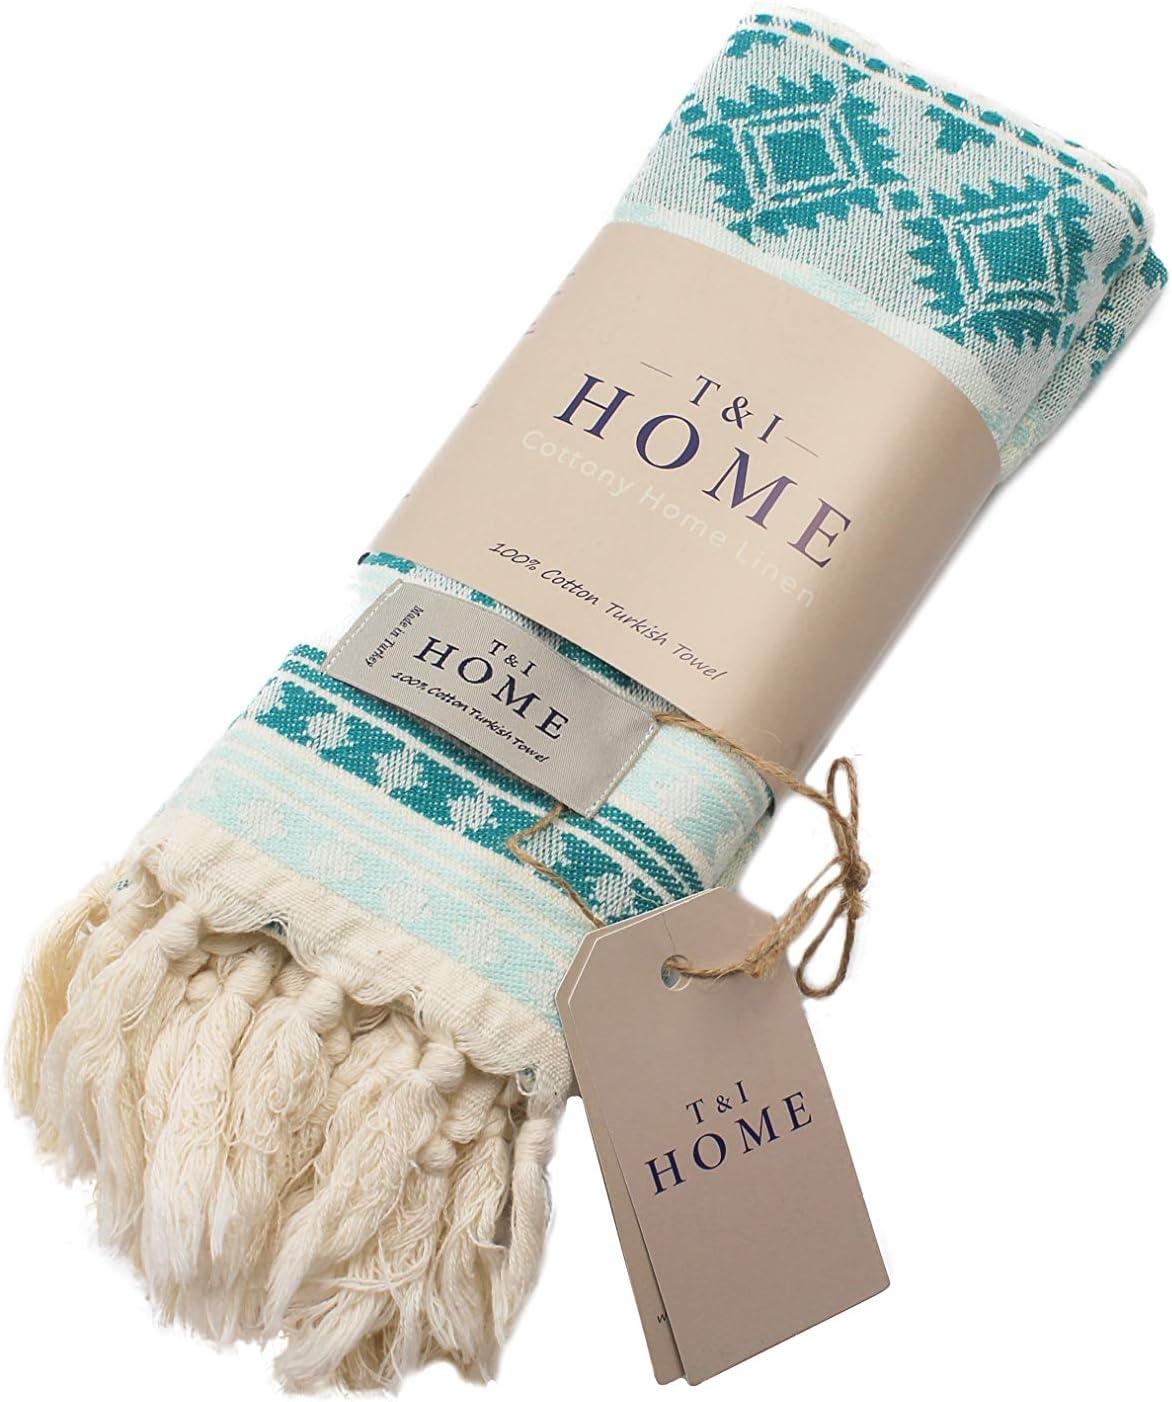 T&I Home Aztec Turkish Hand Towel Set of 2, 16 x 40 Inches, Prewashed, Quick Dry, Face Towel, Hair Towel, Tea Set, Spa, Gym, Decorative Hand Towels for Bathroom, Kitchen Towel Set (Mint)